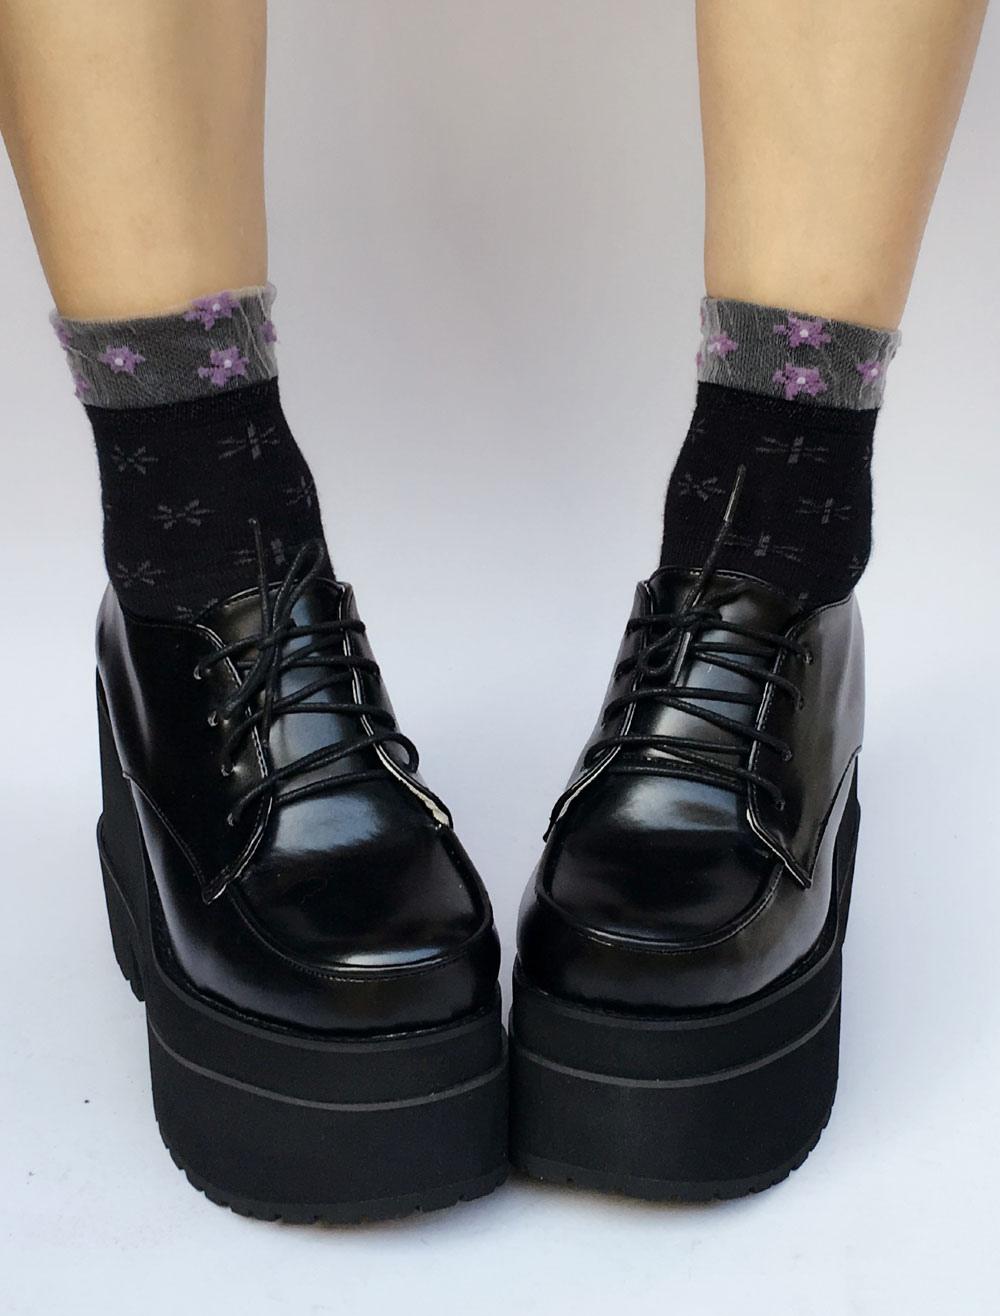 Lolitashow Lolita Platform Shoes Black